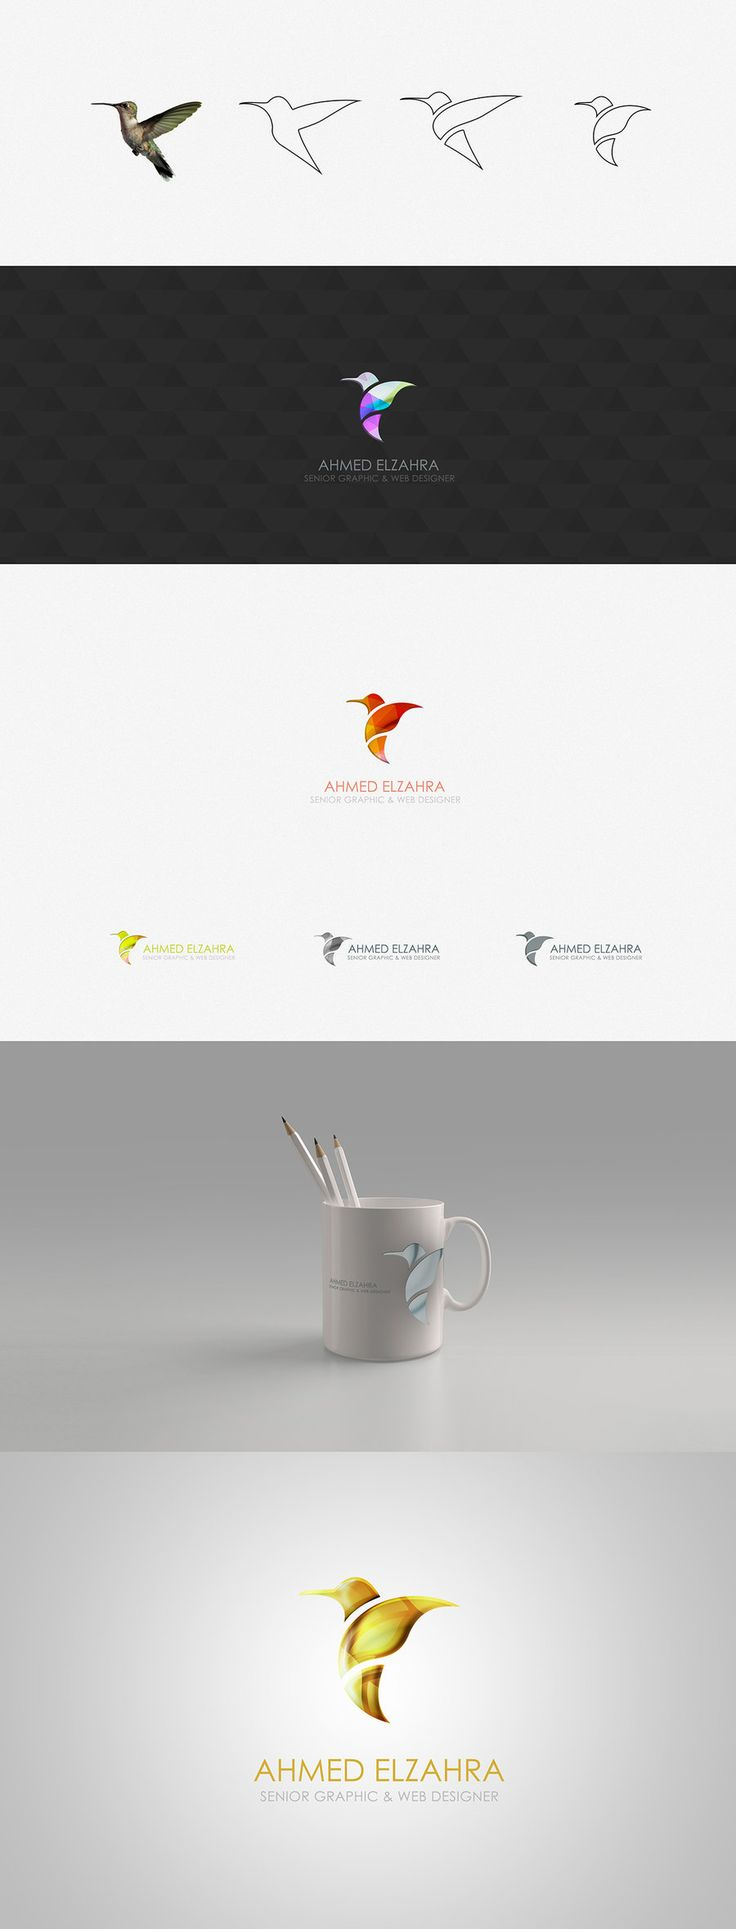 Humming Bird Logo Design http://ahmedelzahra.deviantart.com/ | #corporate #branding #creative #logo #personalized #identity #design #corporatedesign < repinned by www.BlickeDeeler.de | Have a look on www.LogoGestaltung-Hamburg.de